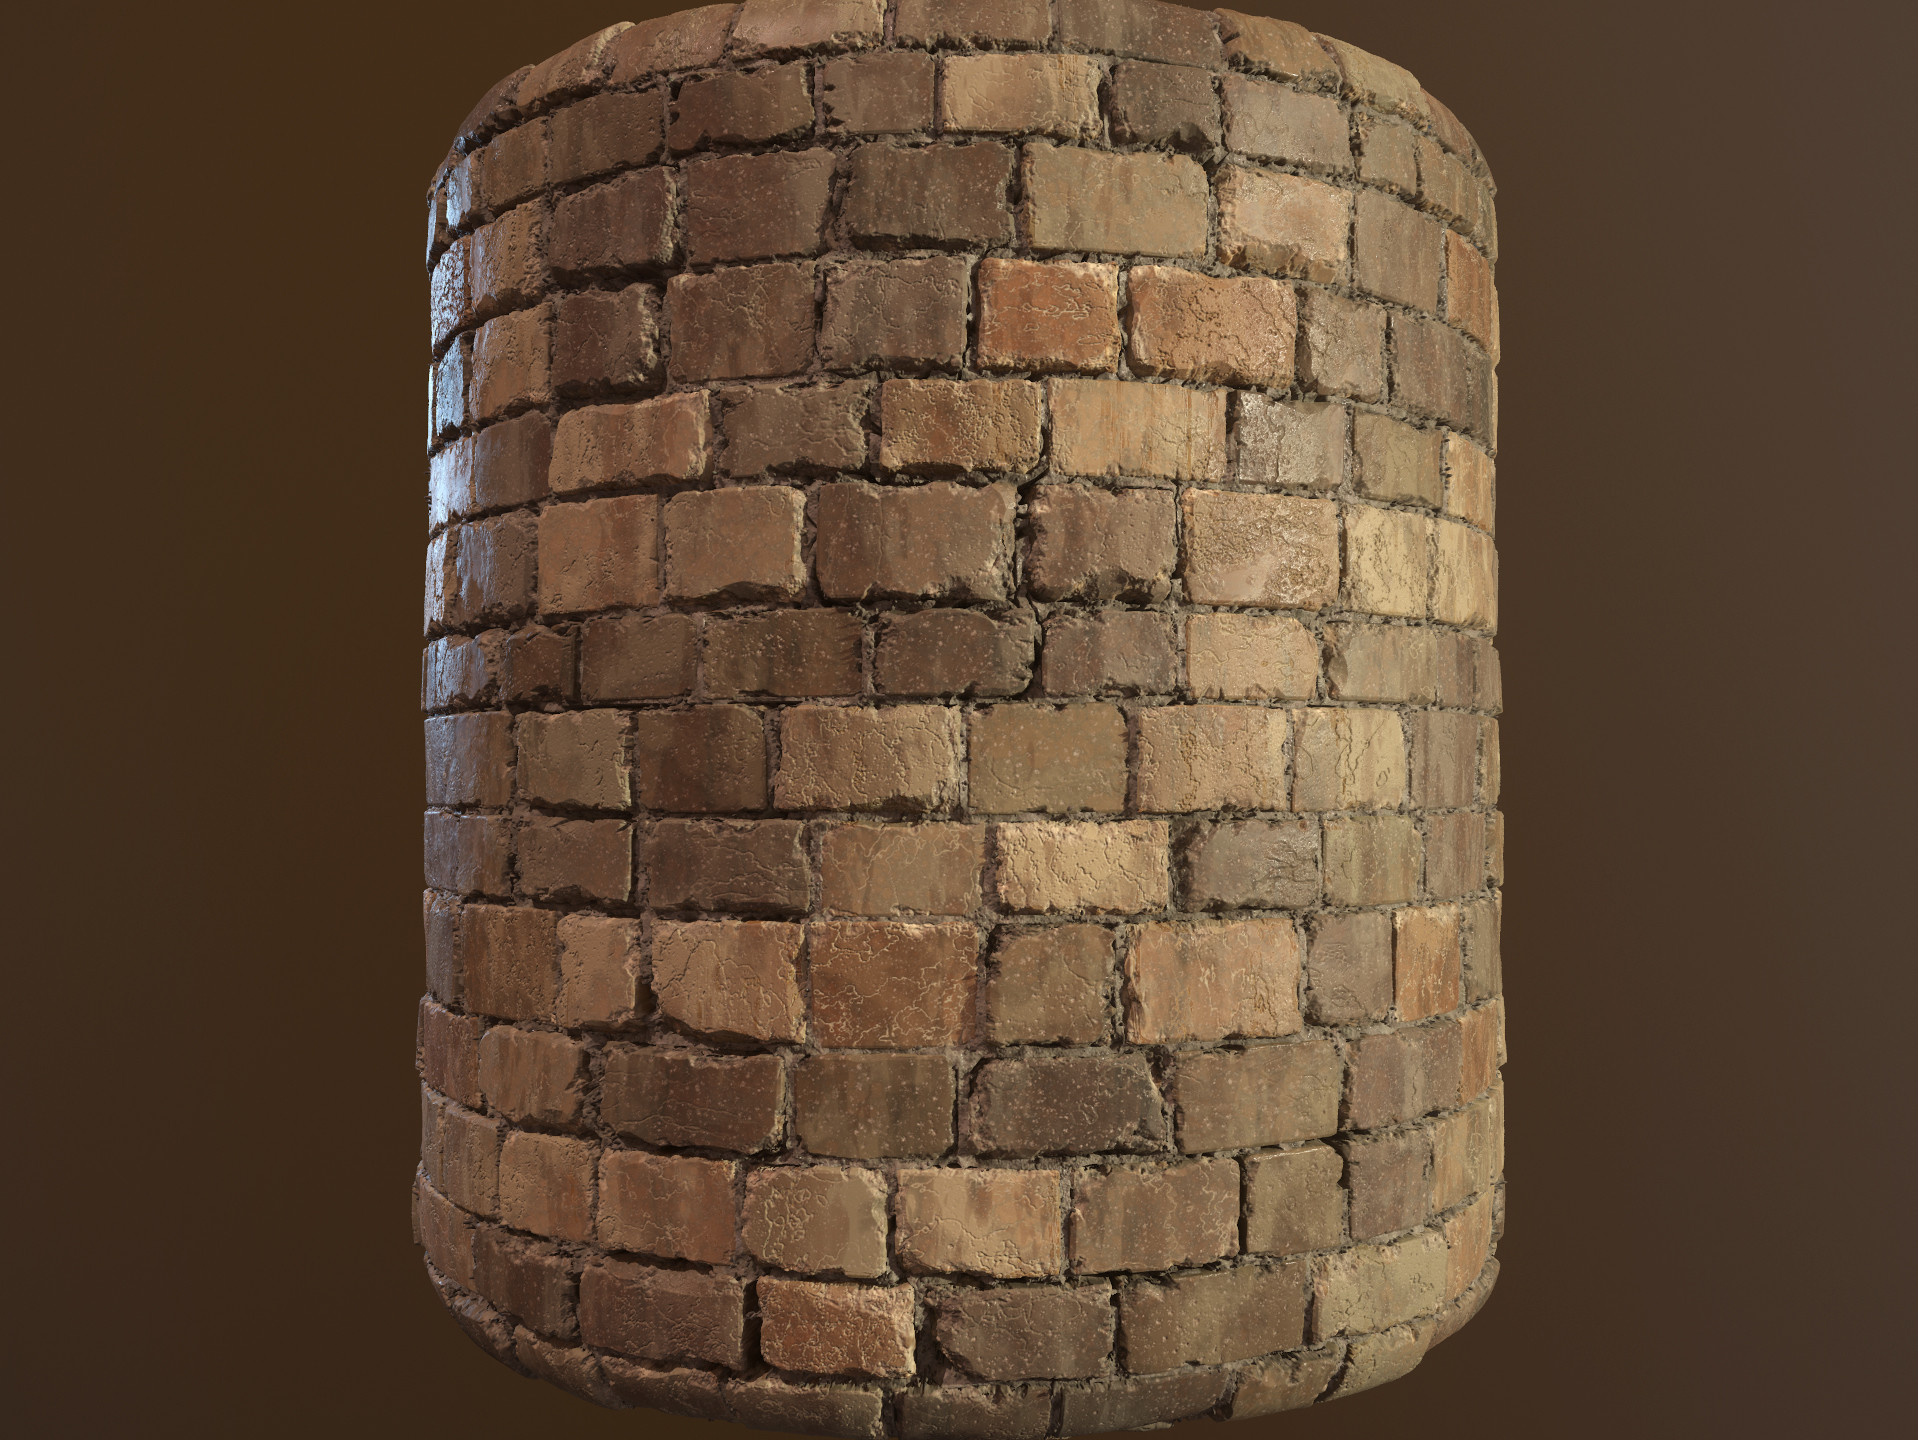 Hugo beyer stones01